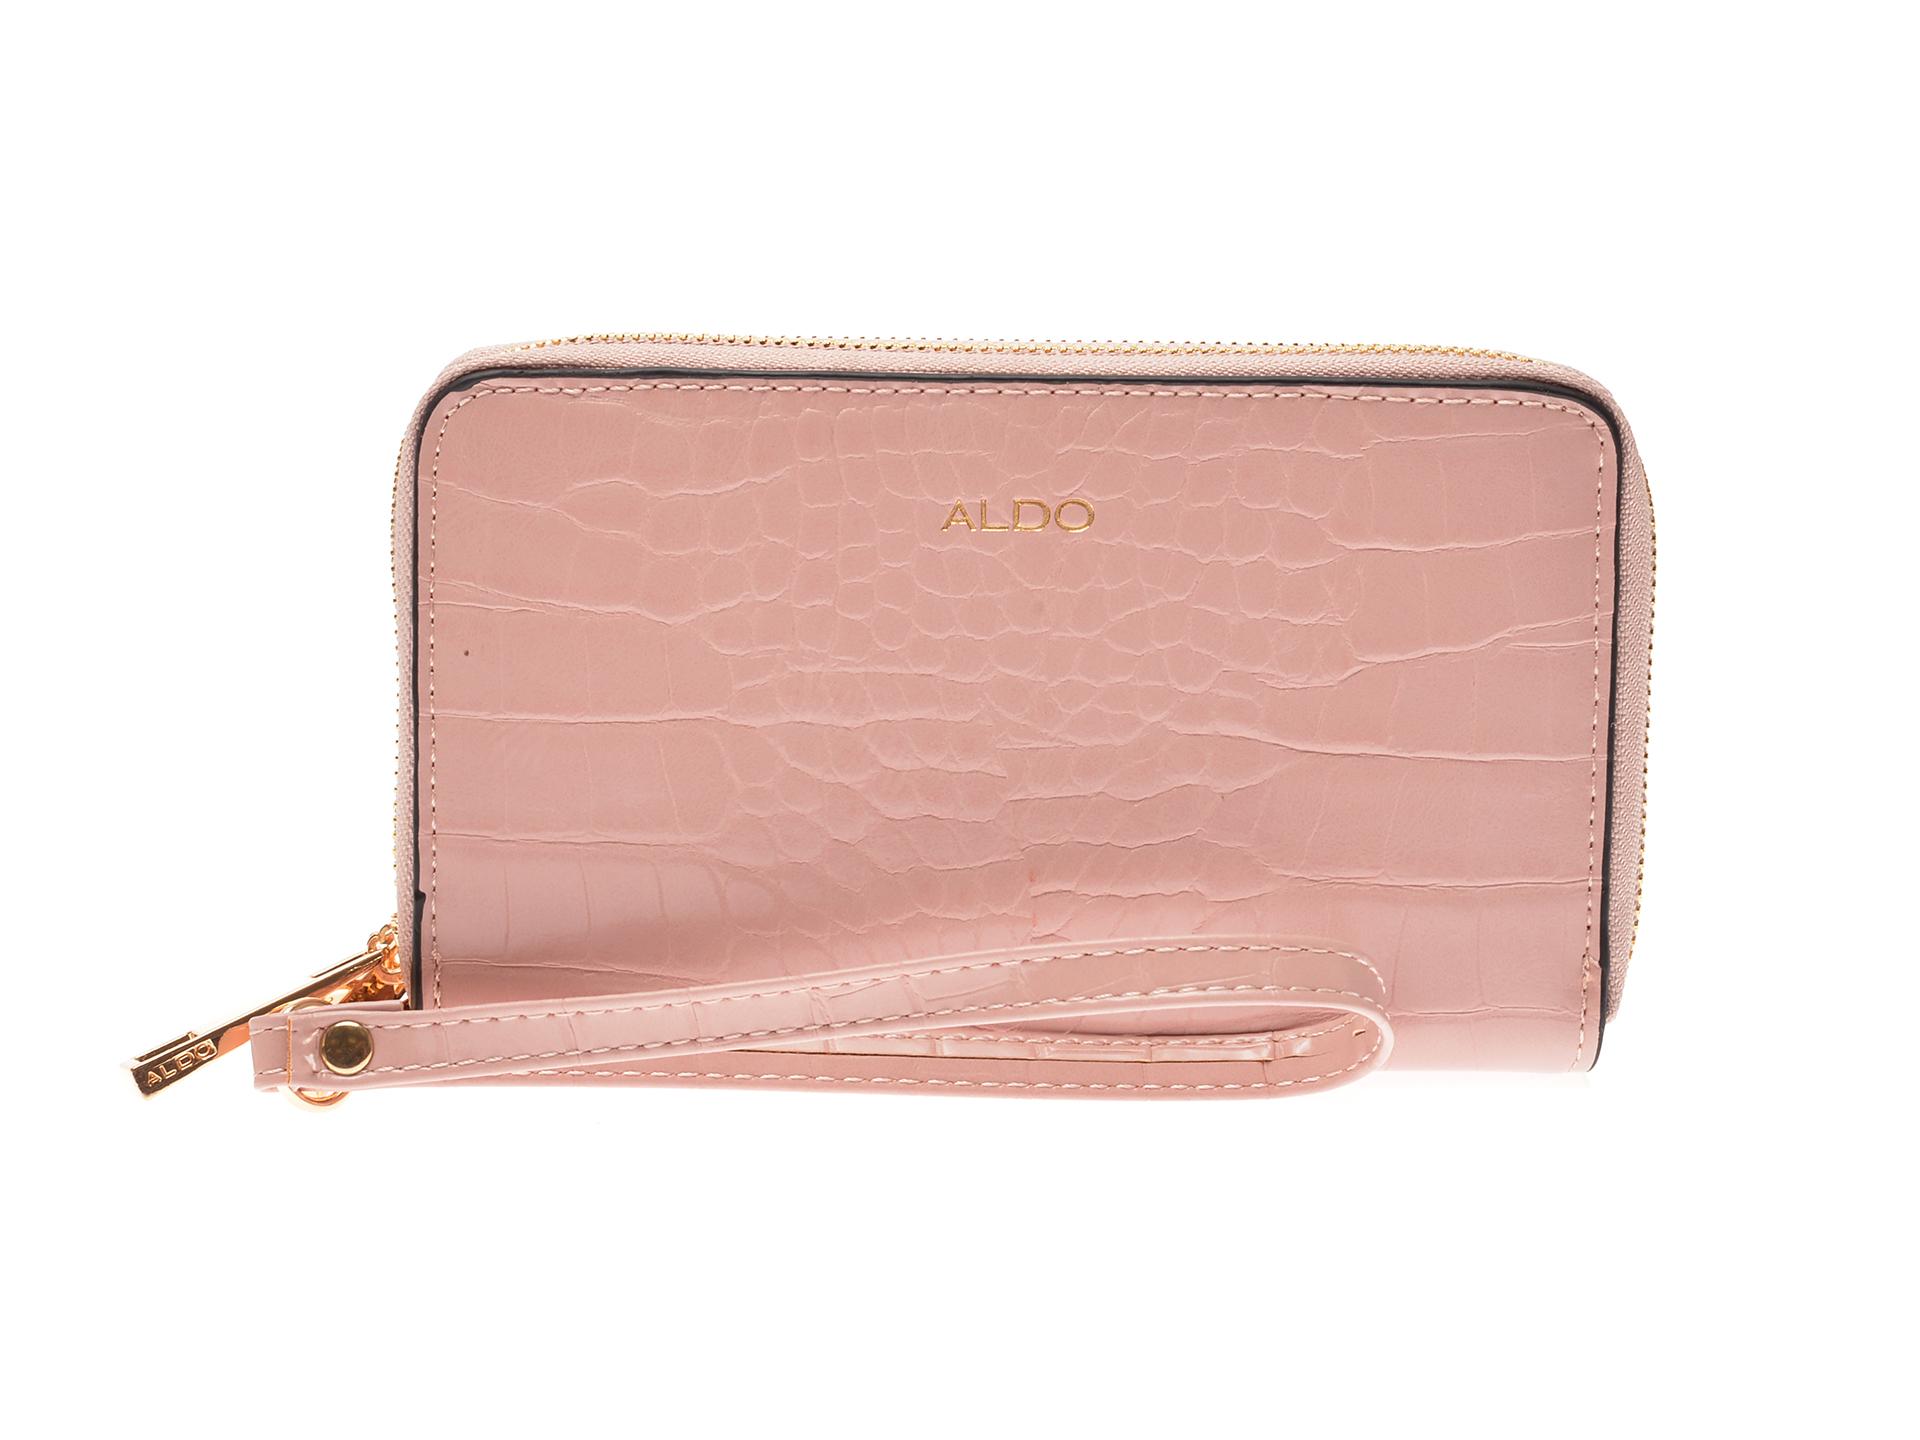 Portofel ALDO roz, Aforeri690, din piele ecologica imagine